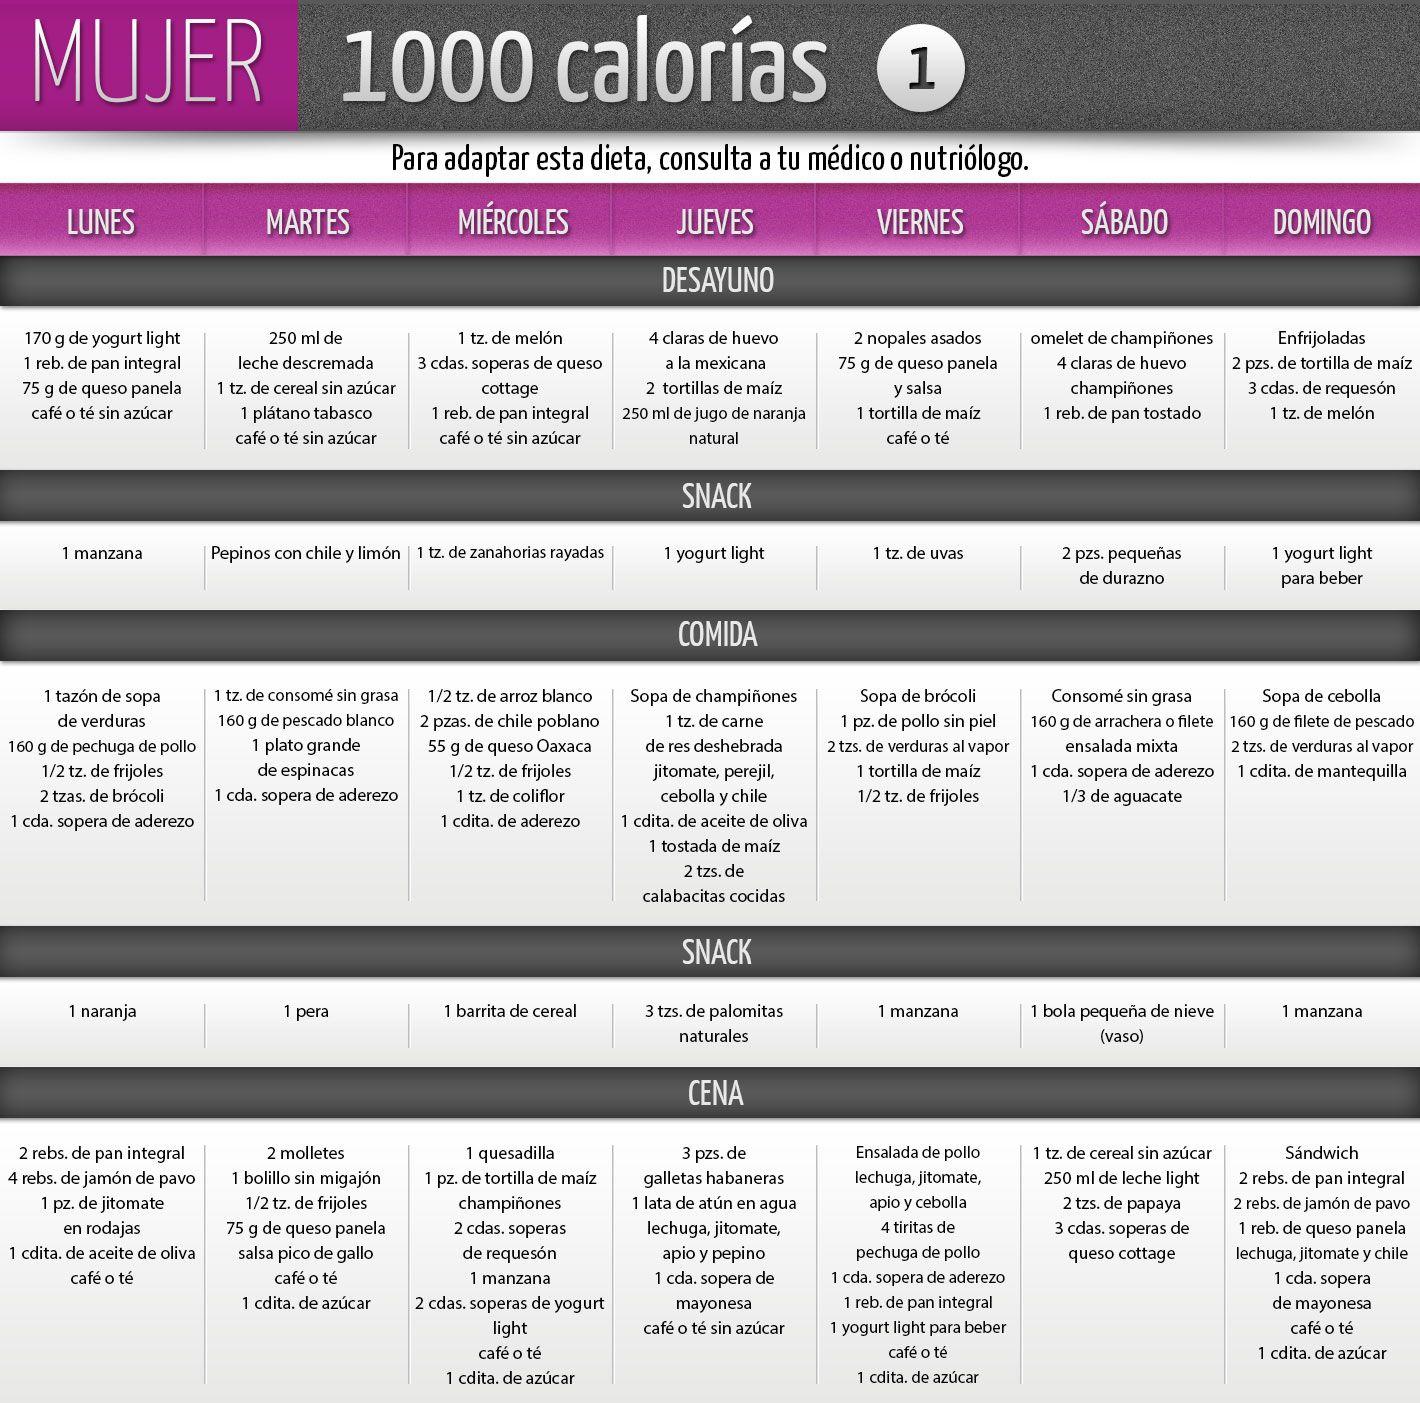 Dietas_Mujer_1000_011 | Dieta | Pinterest | Dietas